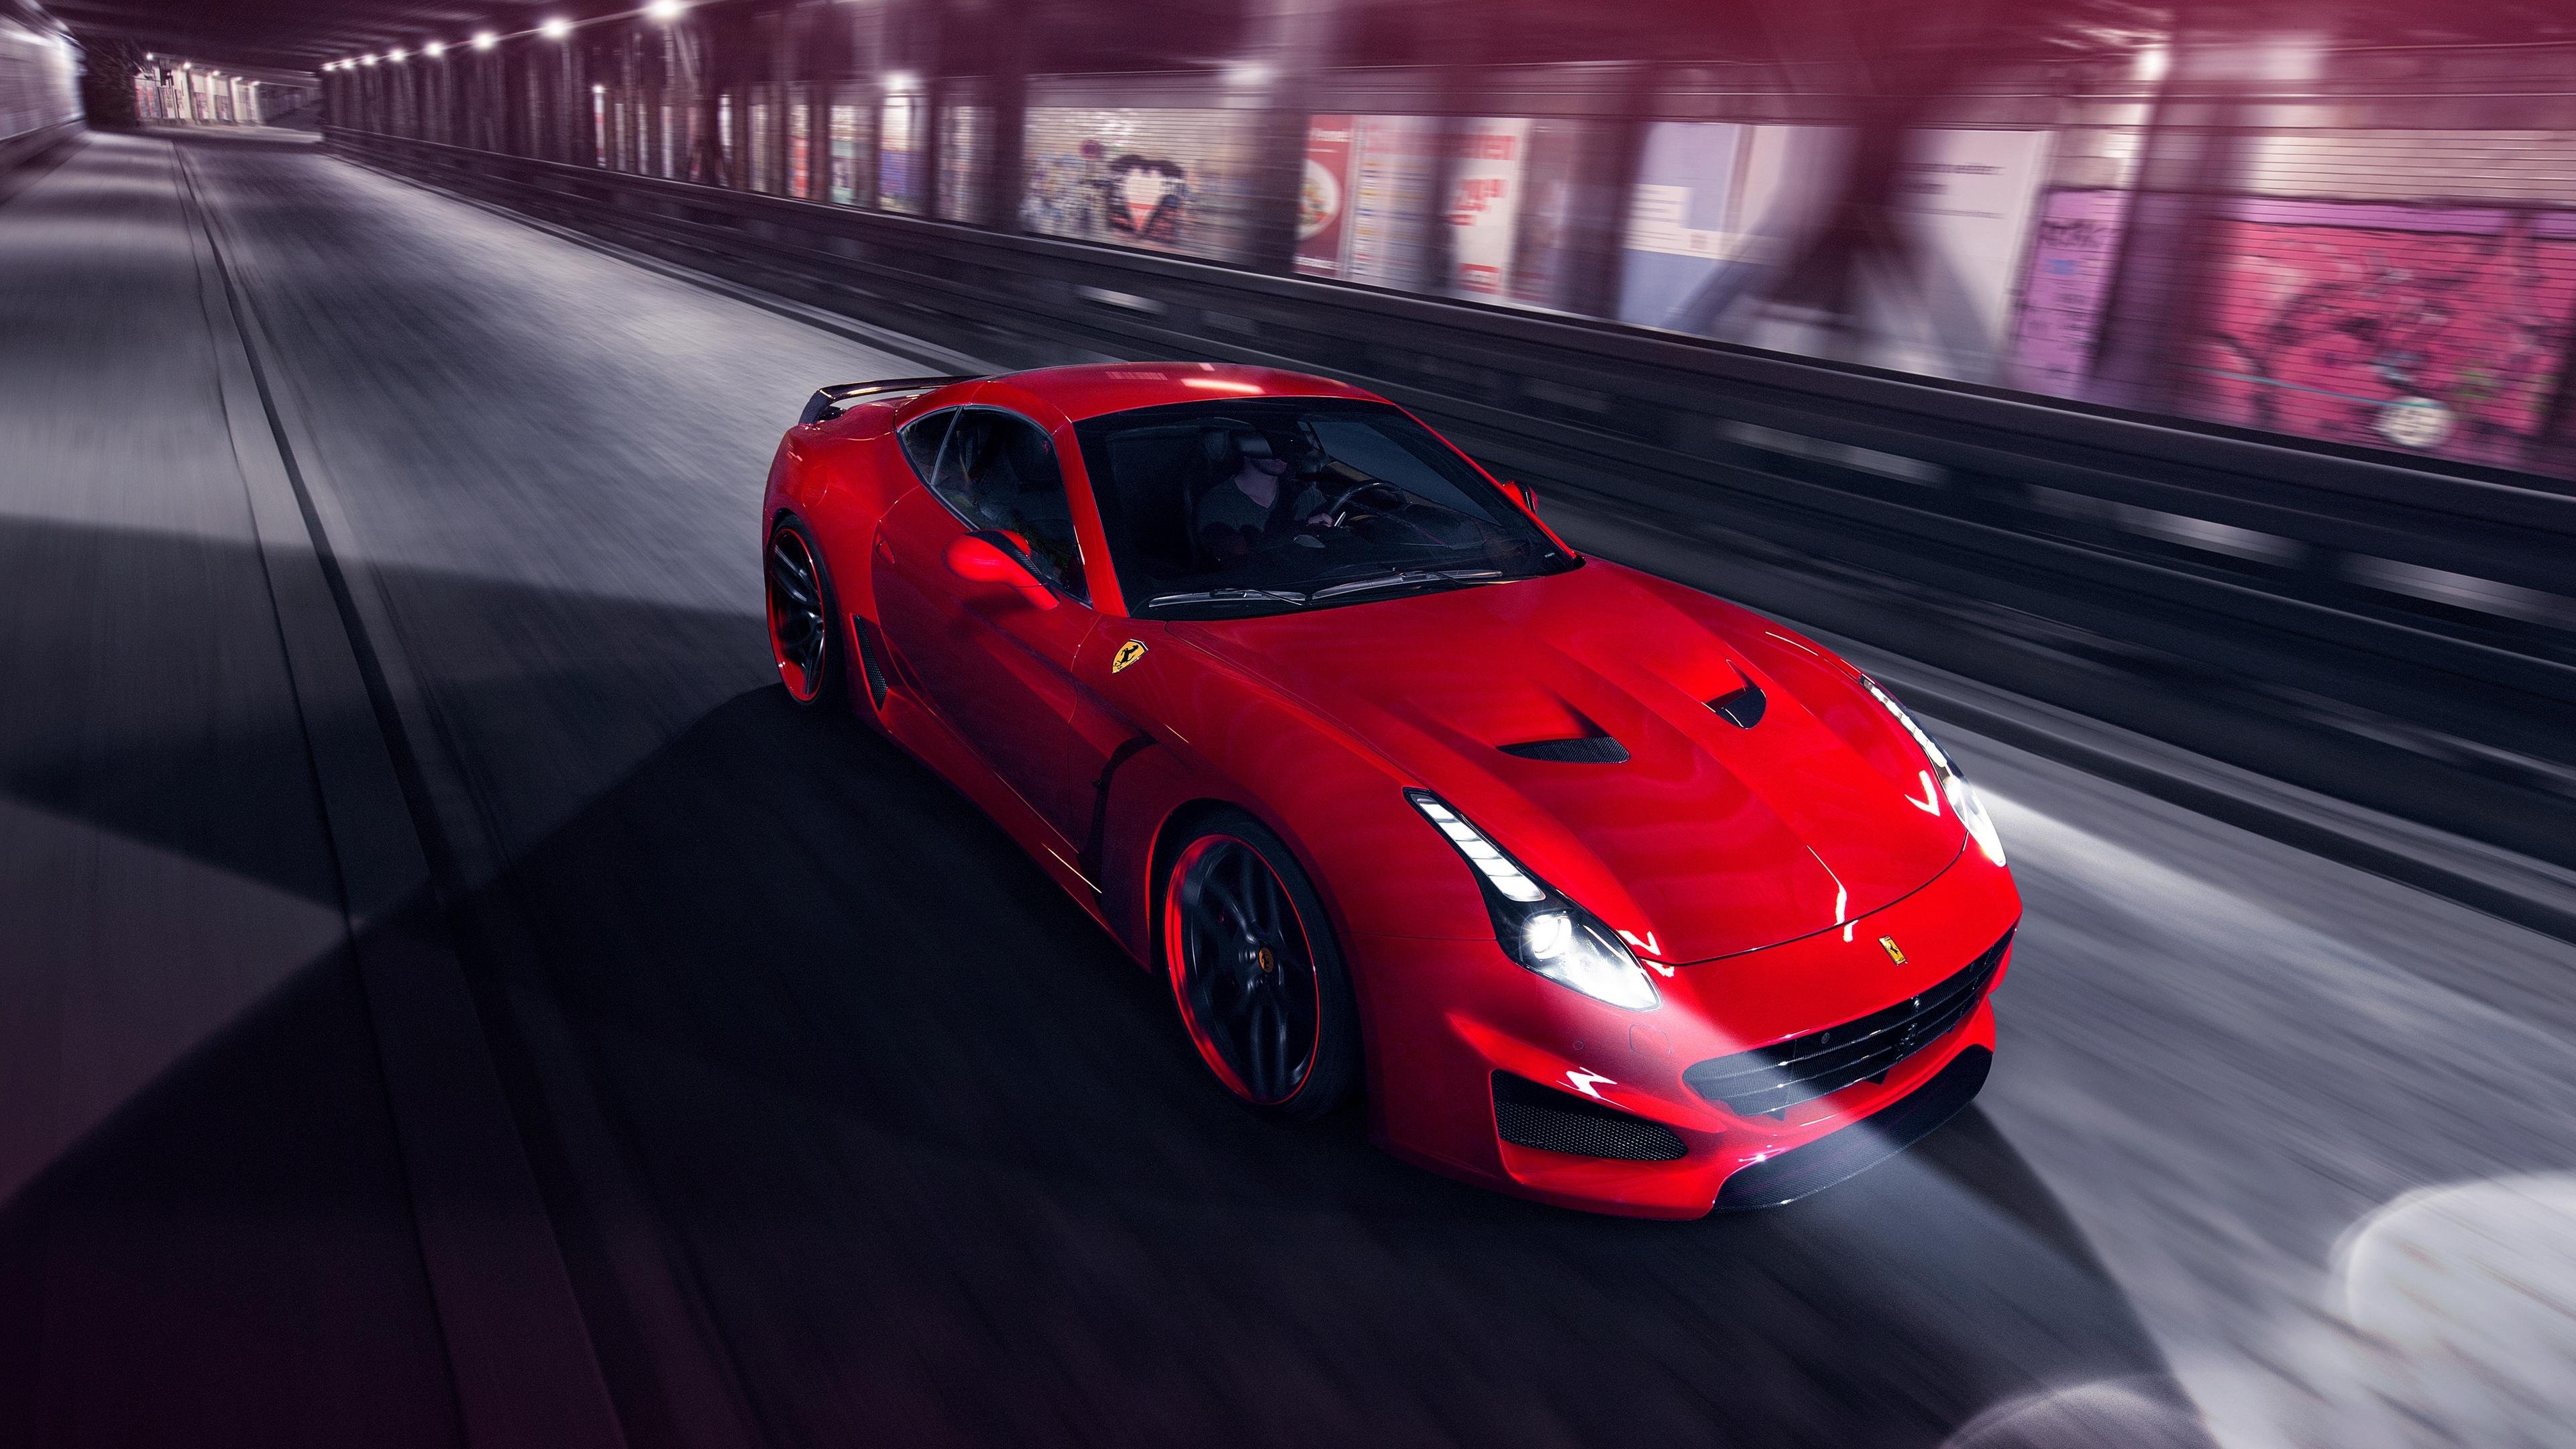 ferrari pininfarina novitec rosso red speed 4k 1538934691 - ferrari, pininfarina, novitec rosso, red, speed 4k - Pininfarina, novitec rosso, Ferrari